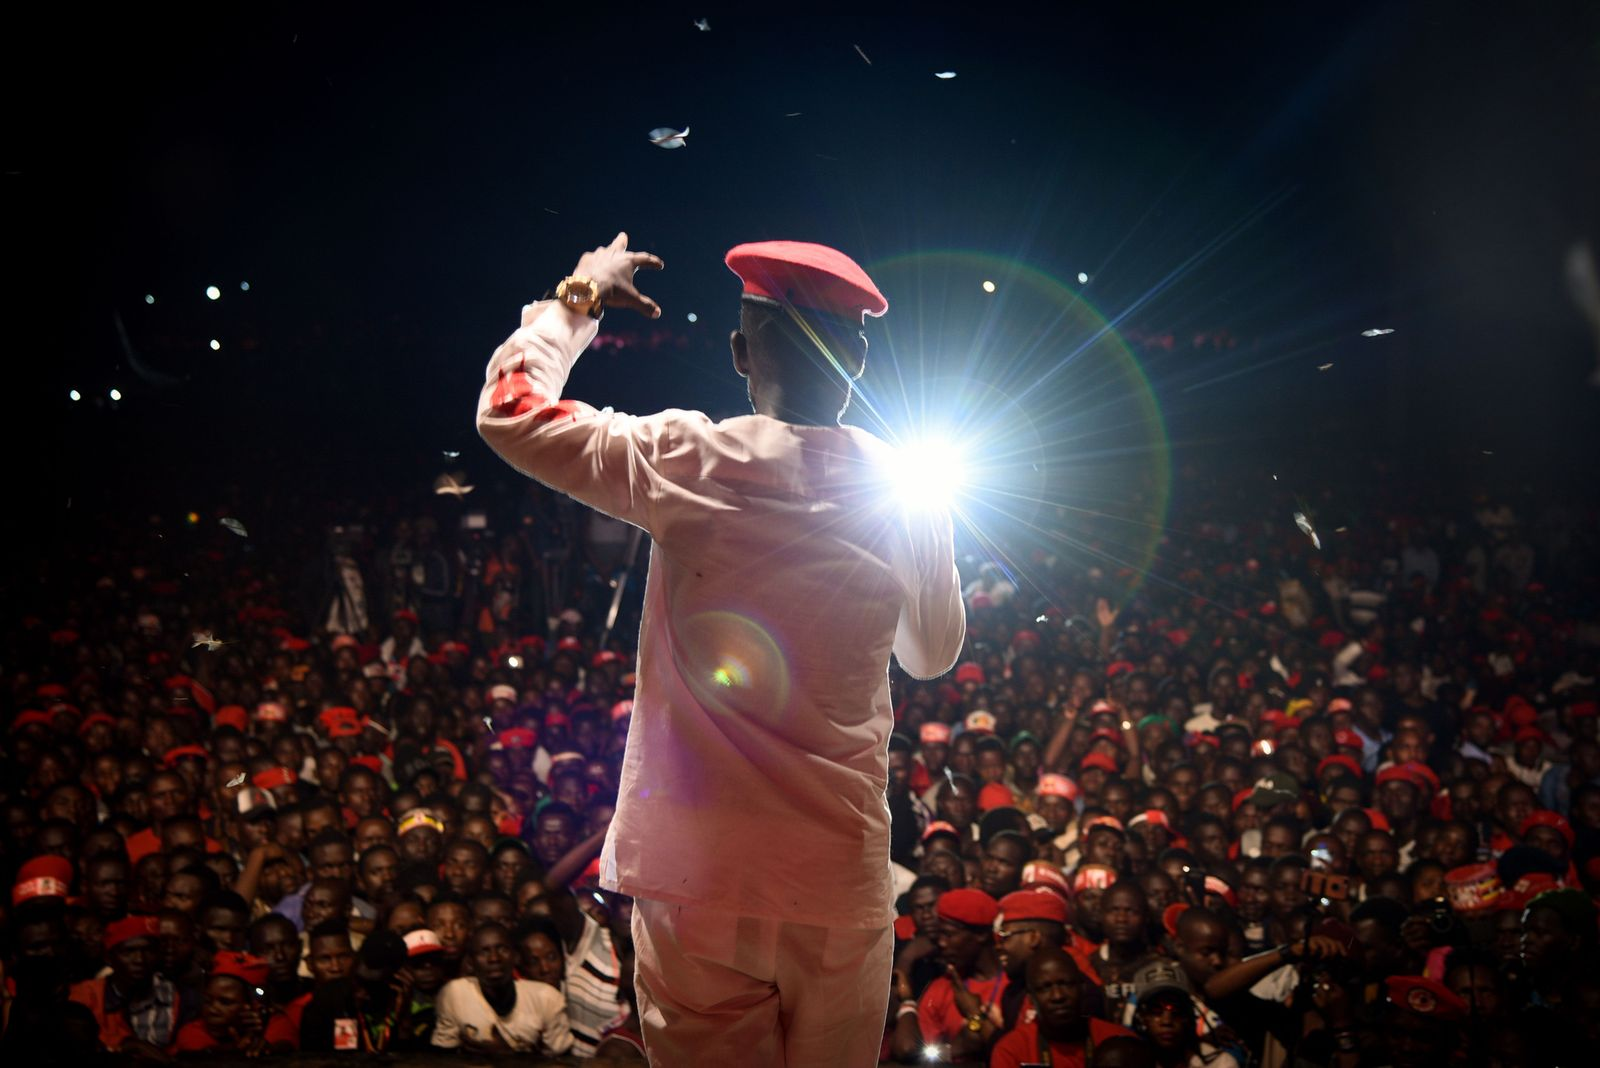 TOPSHOT-CORRECTION-UGANDA-ART-MUSIC-POLITICS